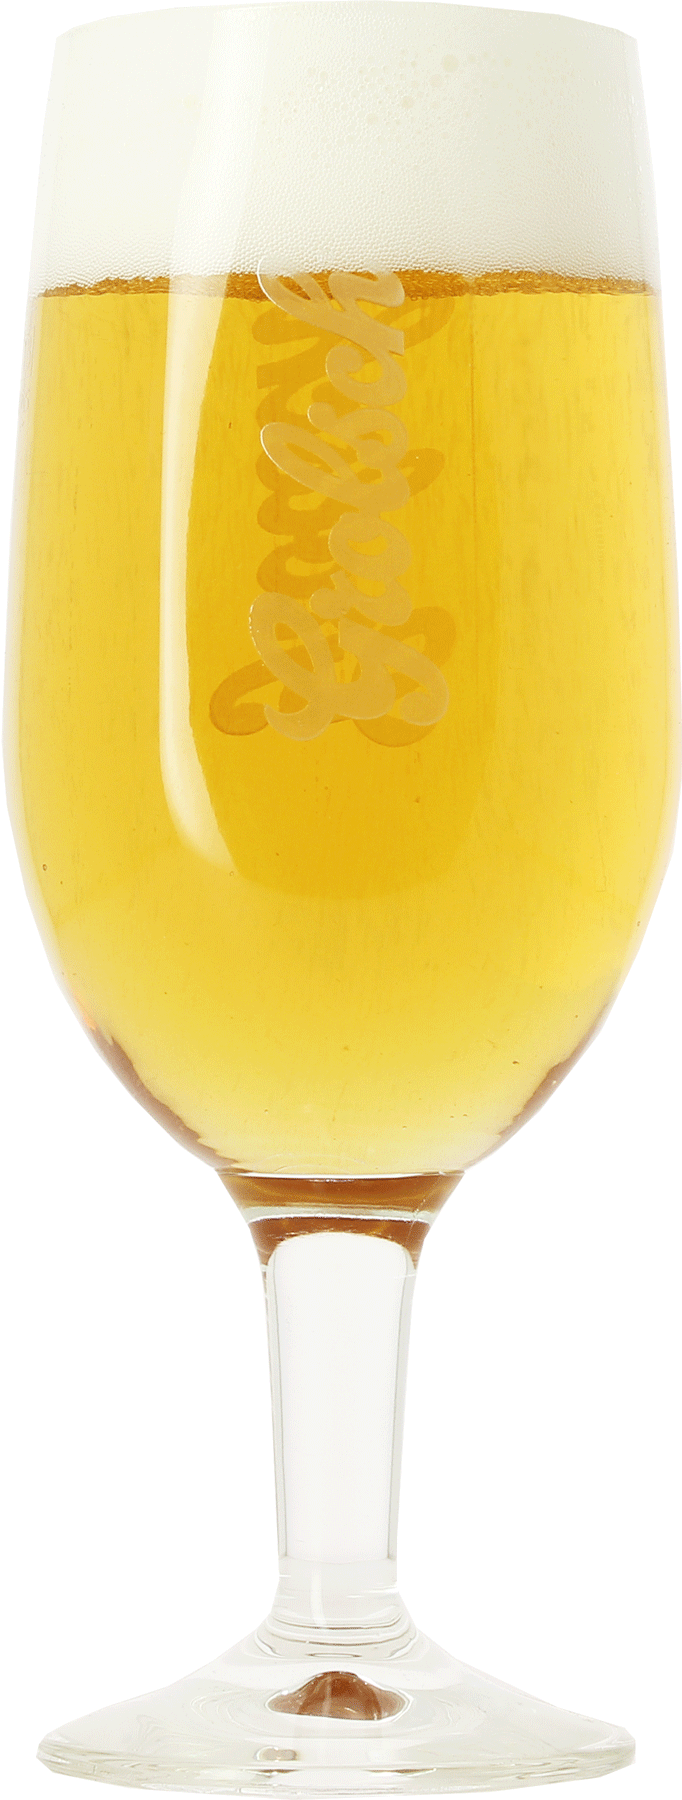 Copa Grolsch - 25 cl